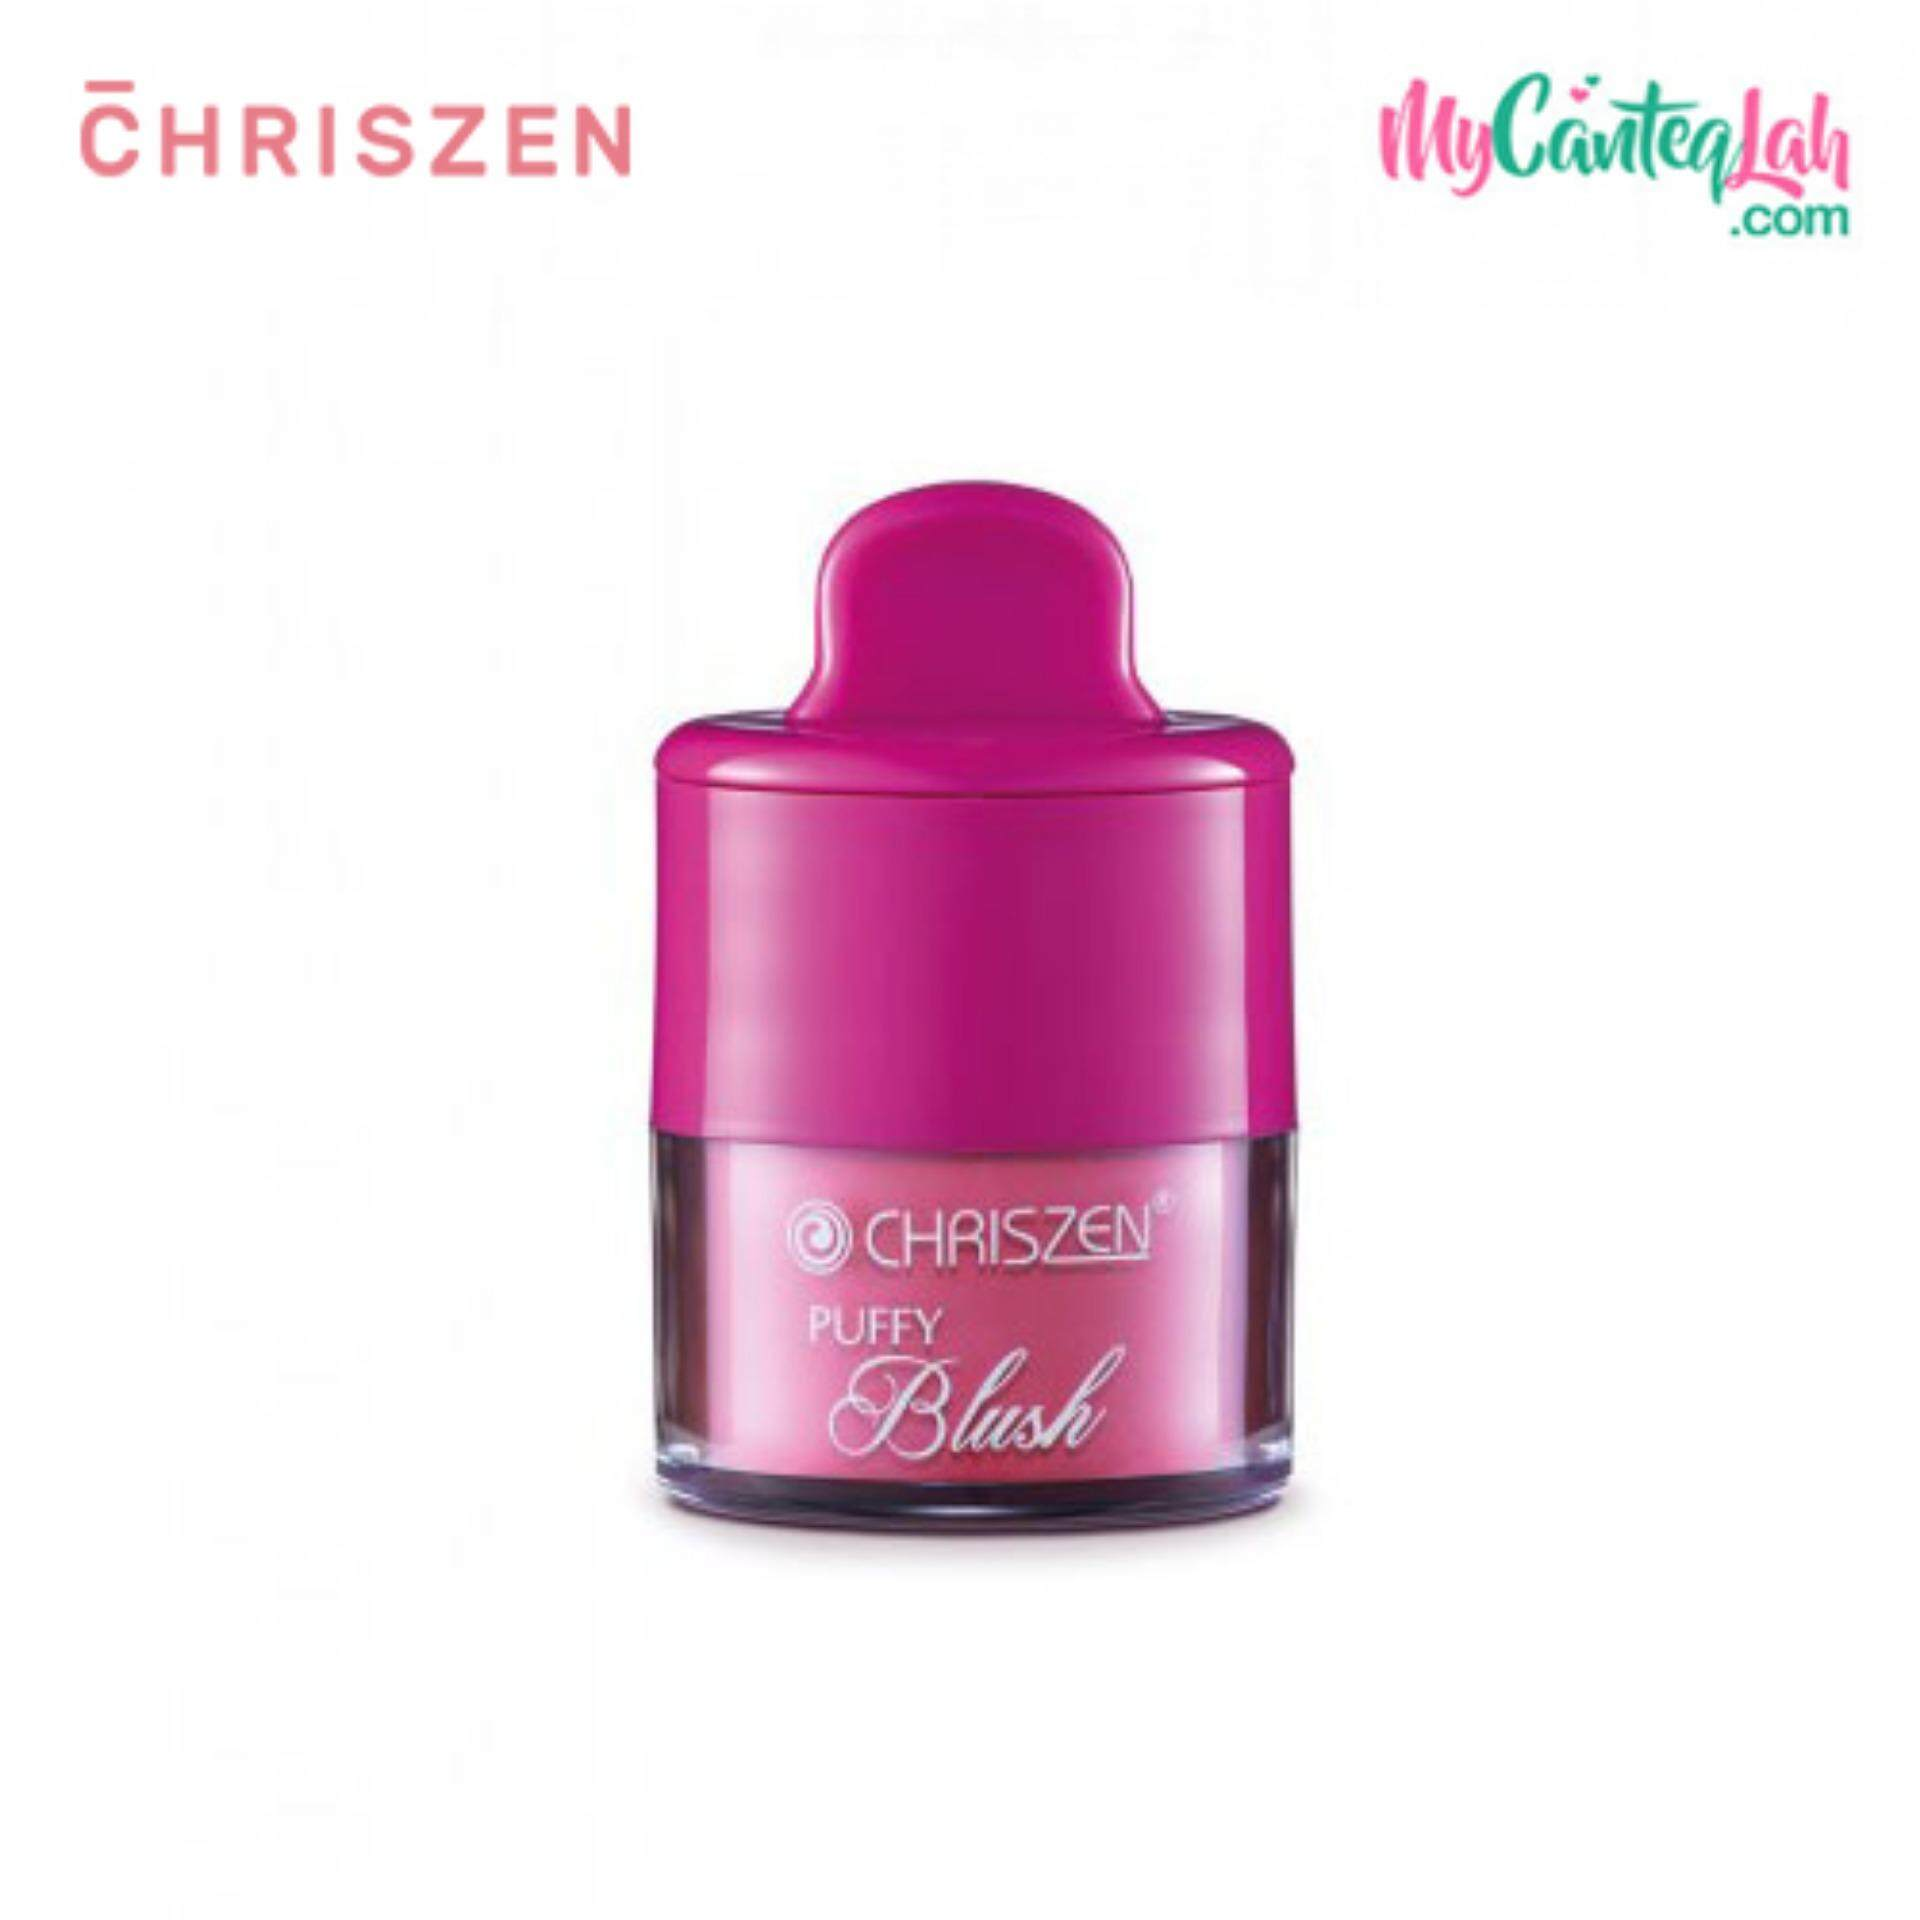 Bioaqua Bb Cushion Blusher Malaysia Peach Pink 02 Blush On Flawless Cheek Chriszen Puffy Light